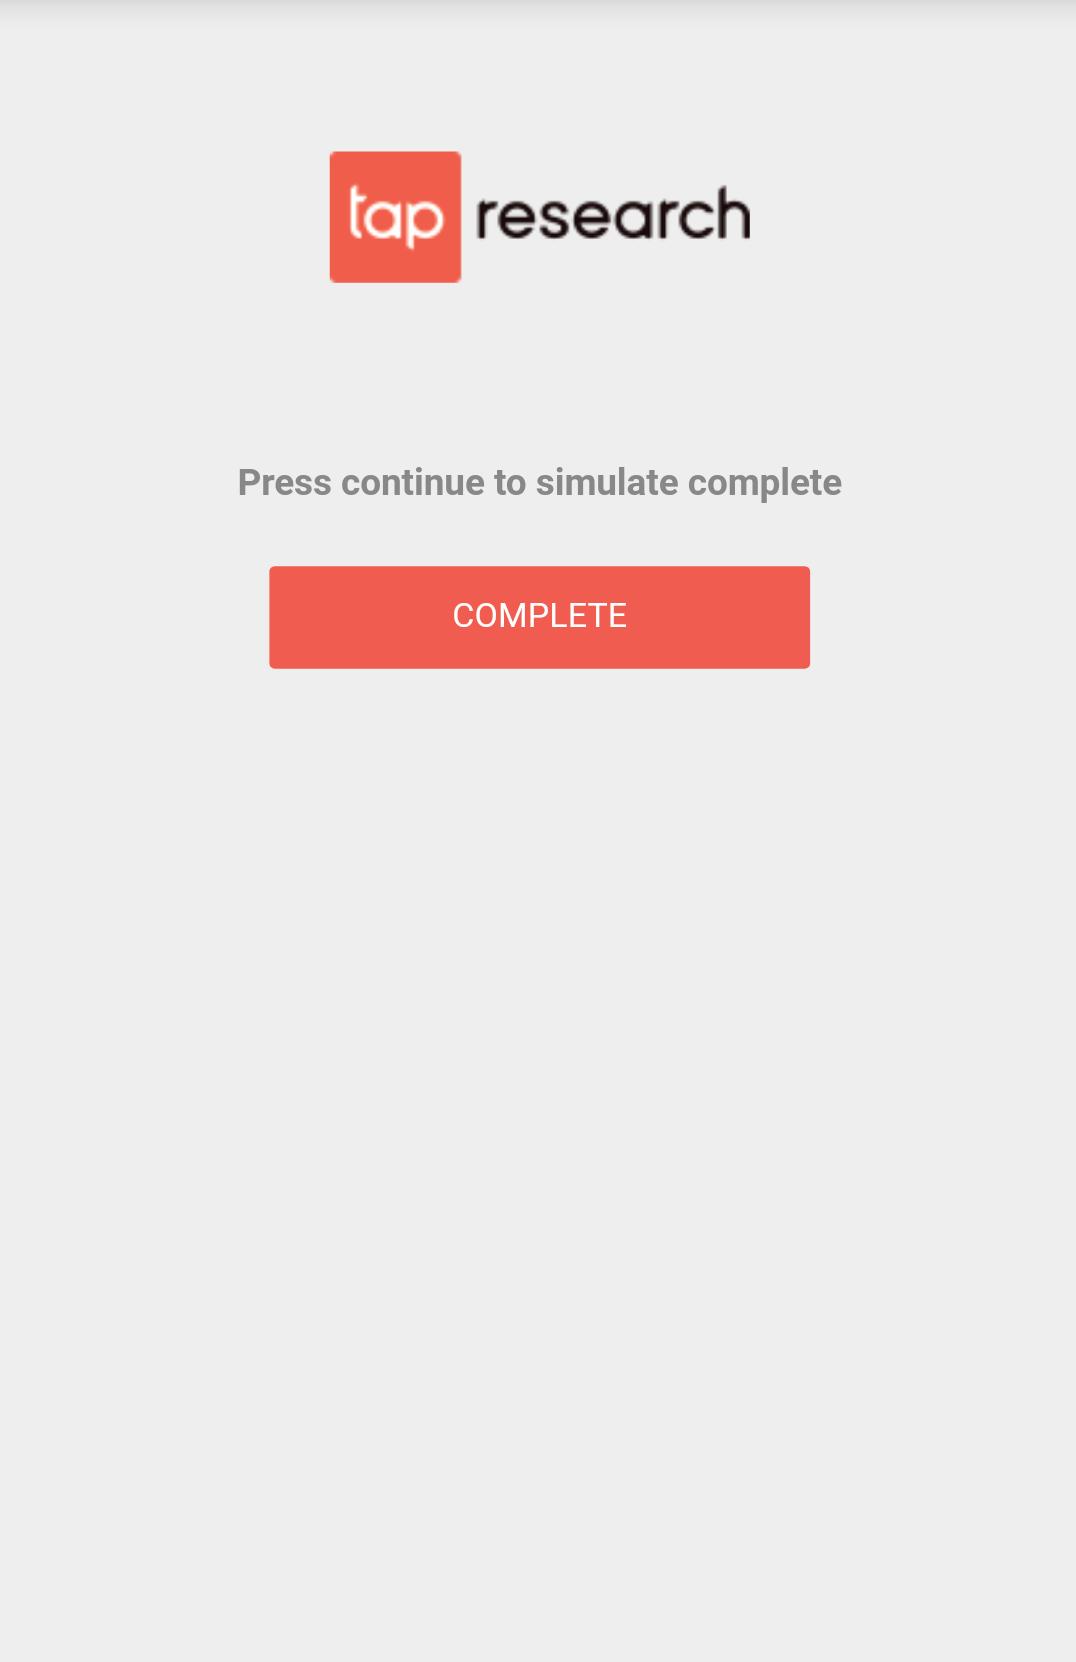 App Checklist